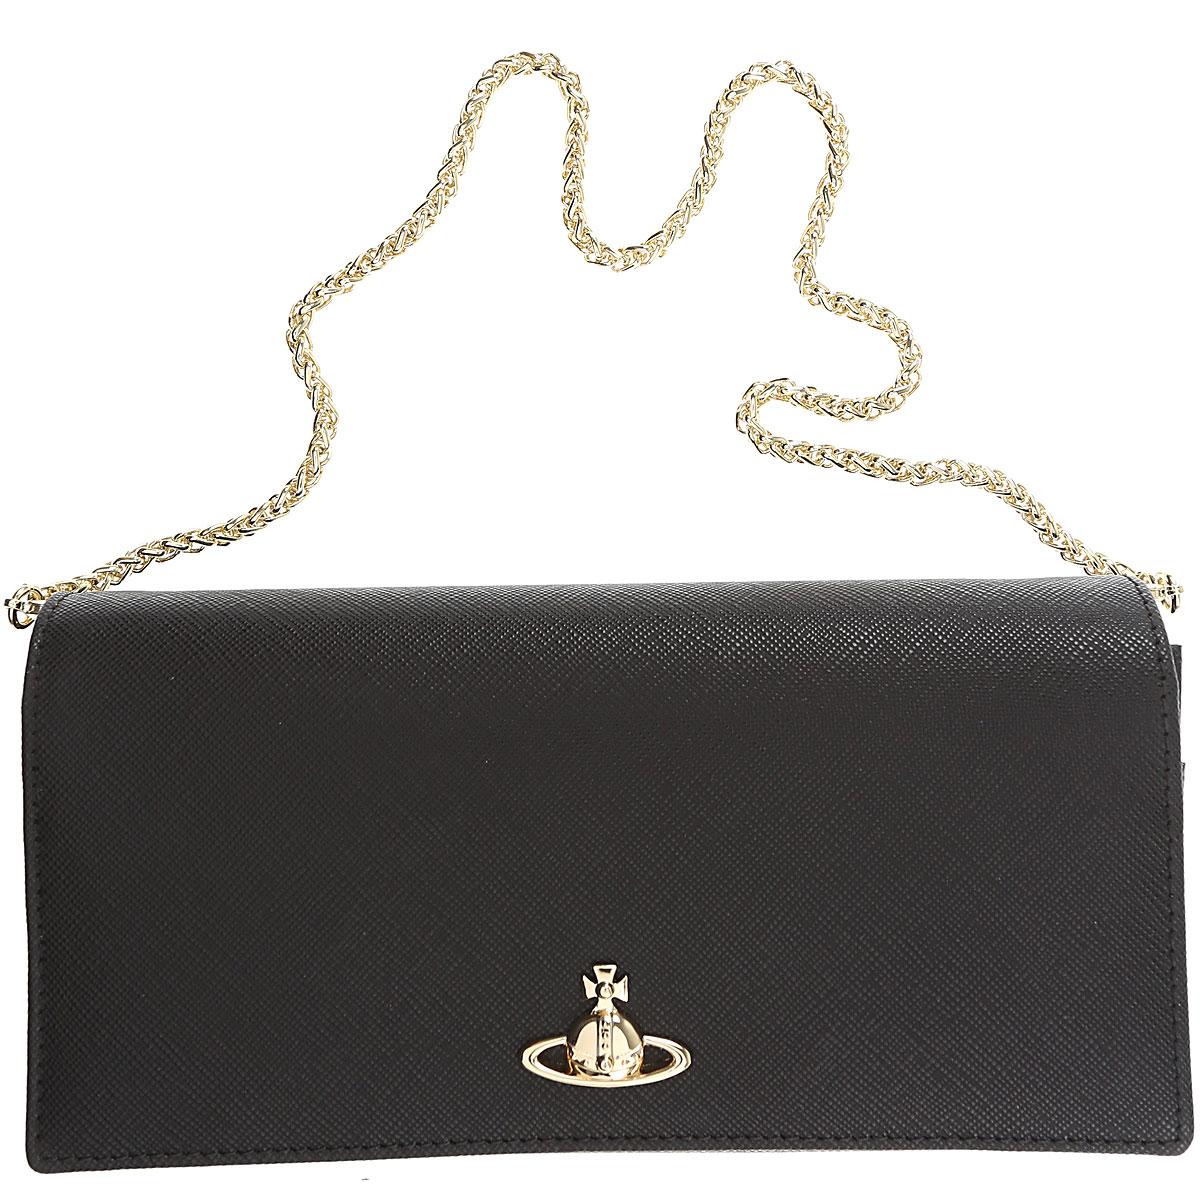 37c55083ba7 ... long chain wallet black; womens wallets vivienne westwood style code  51030008 40187 2841 ...